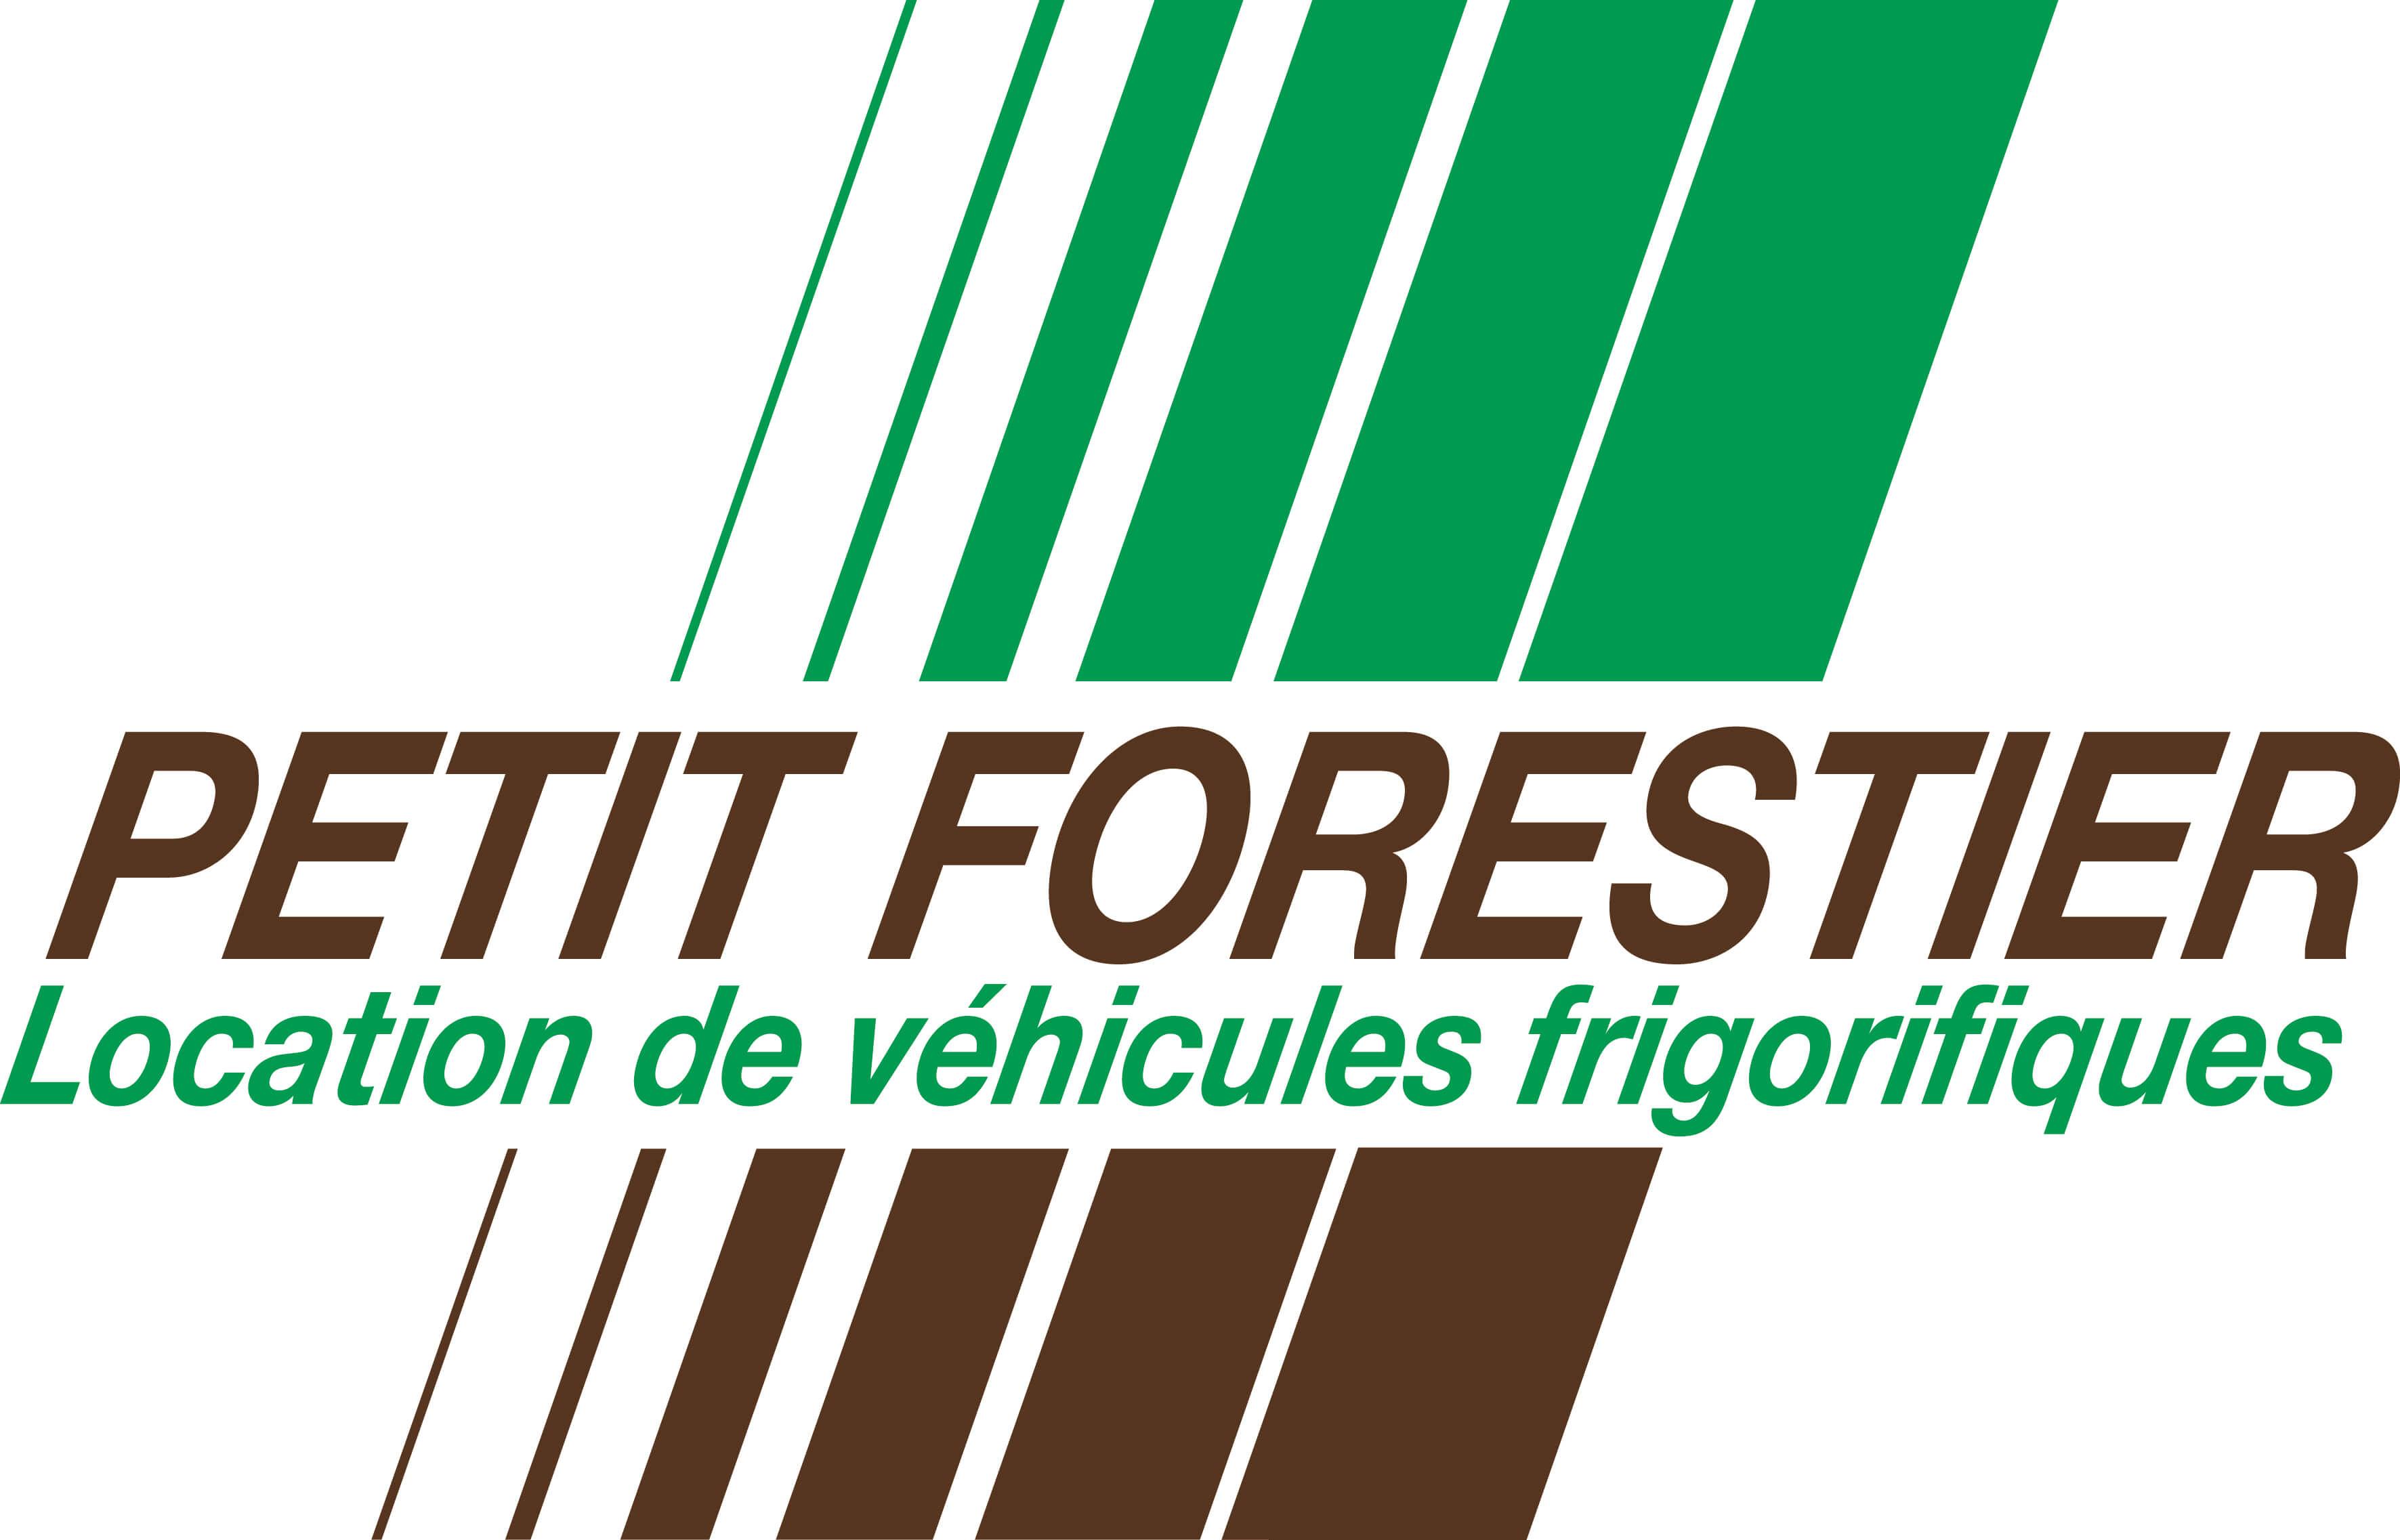 Petit Forestier